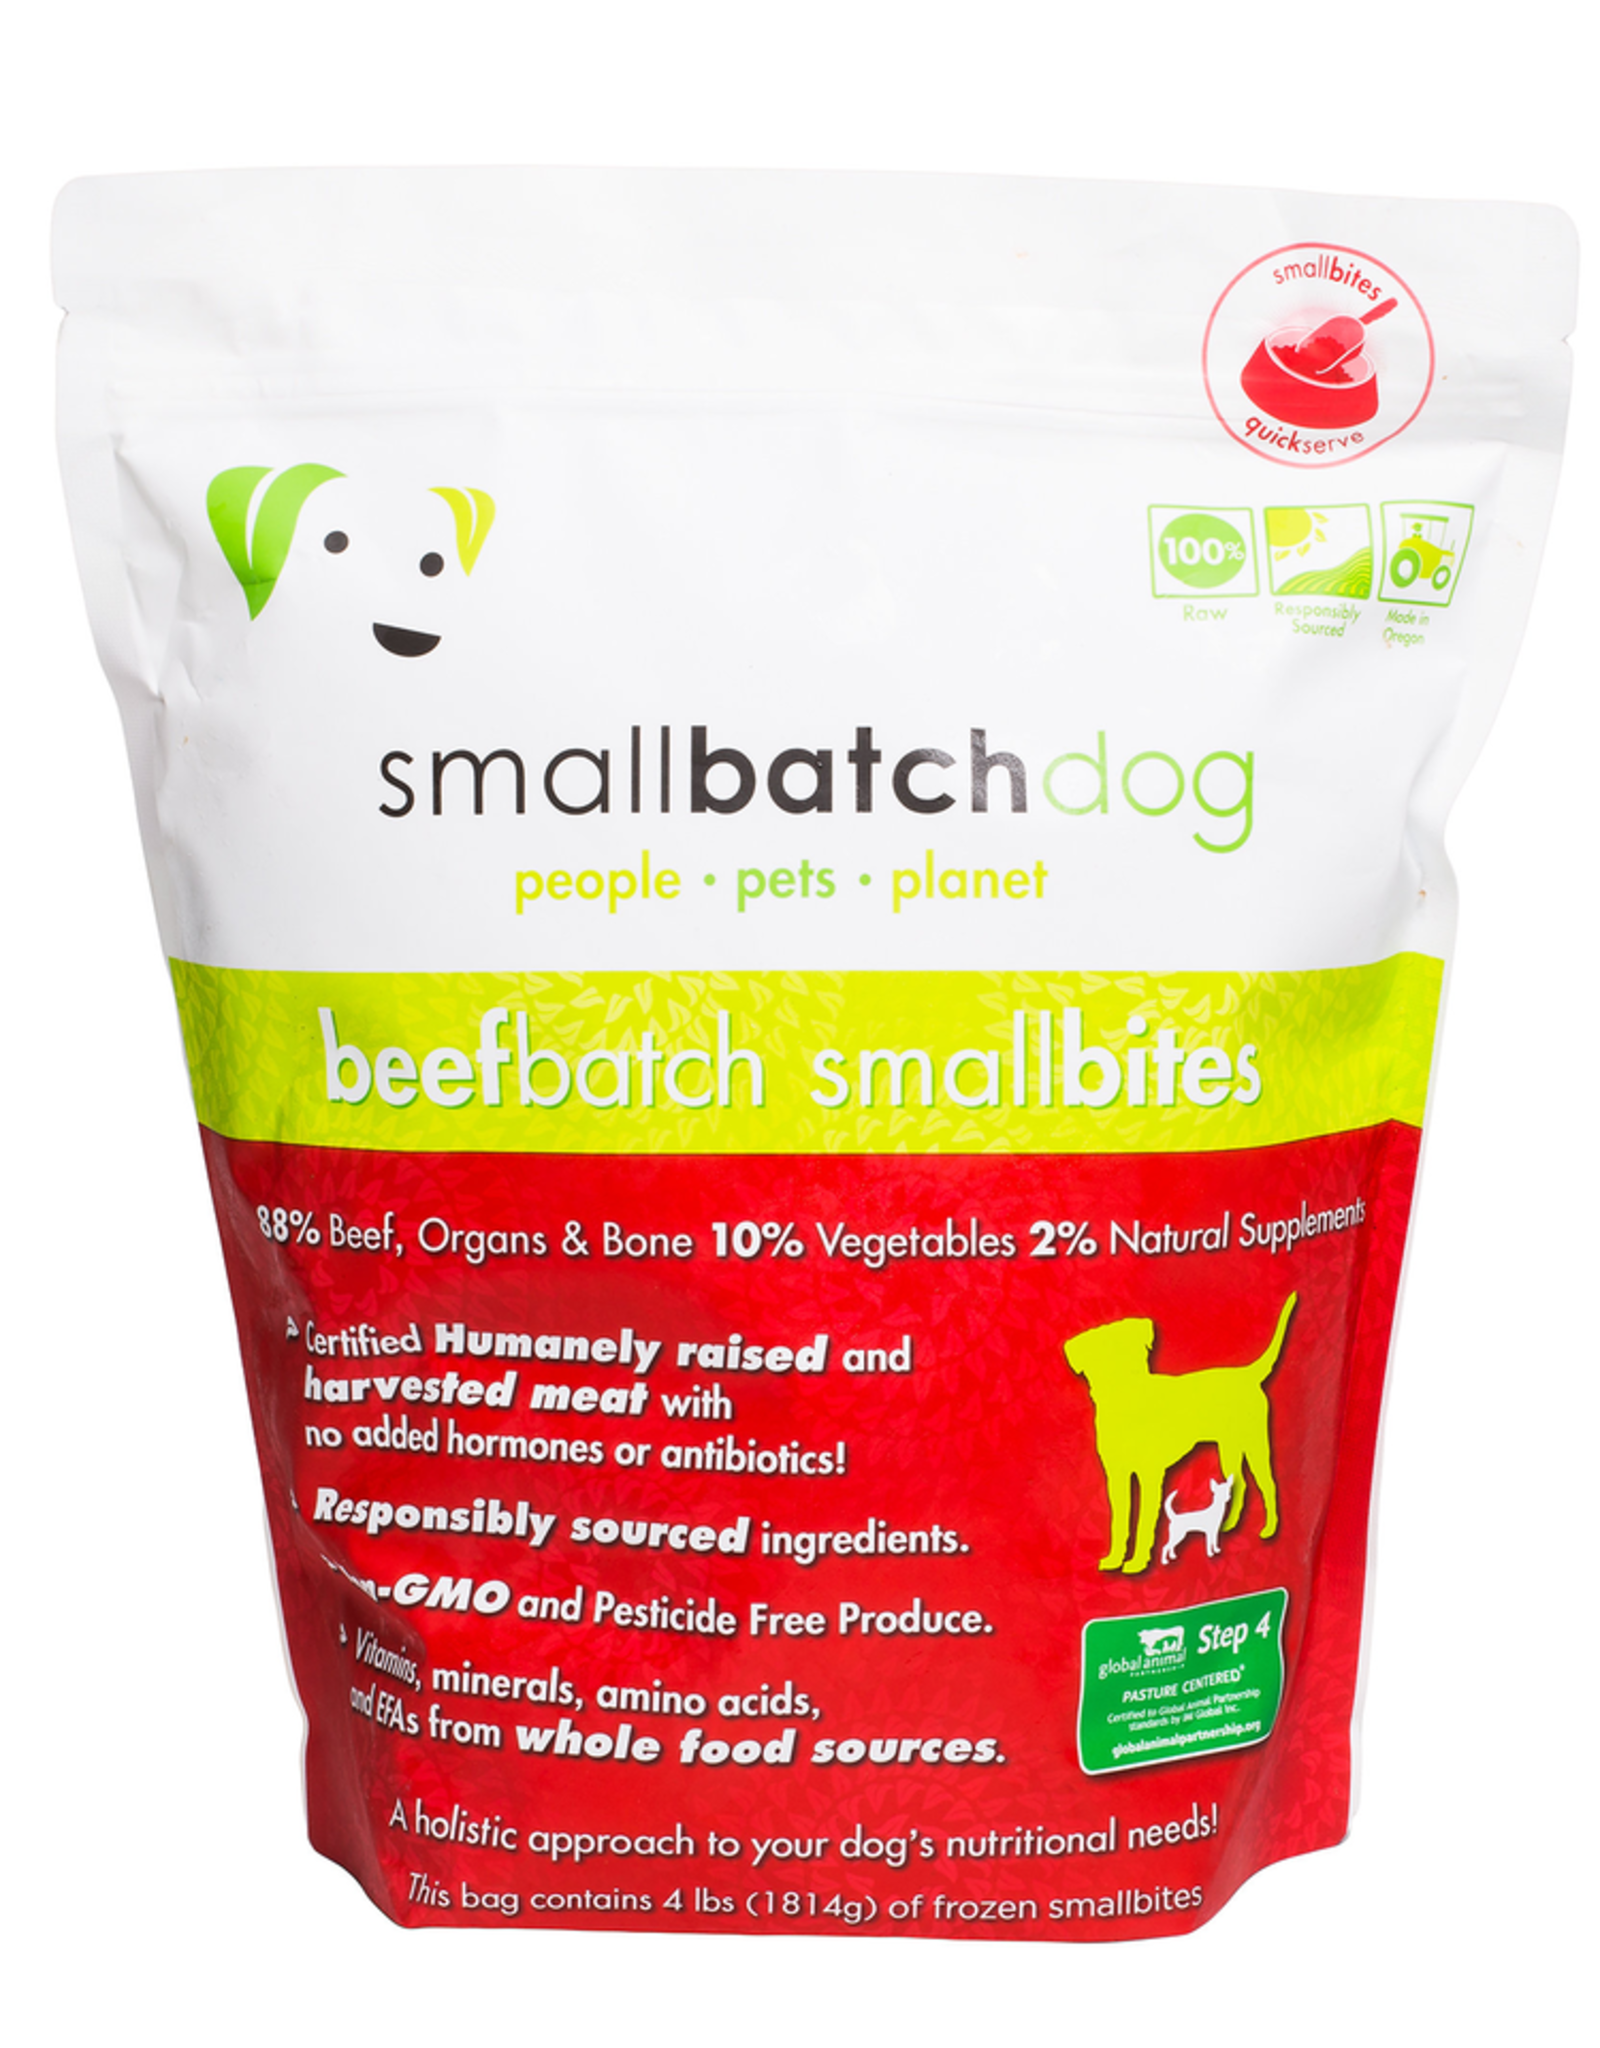 Smallbatch SMALLBATCH DOG FROZEN RAW BEEF BATCH